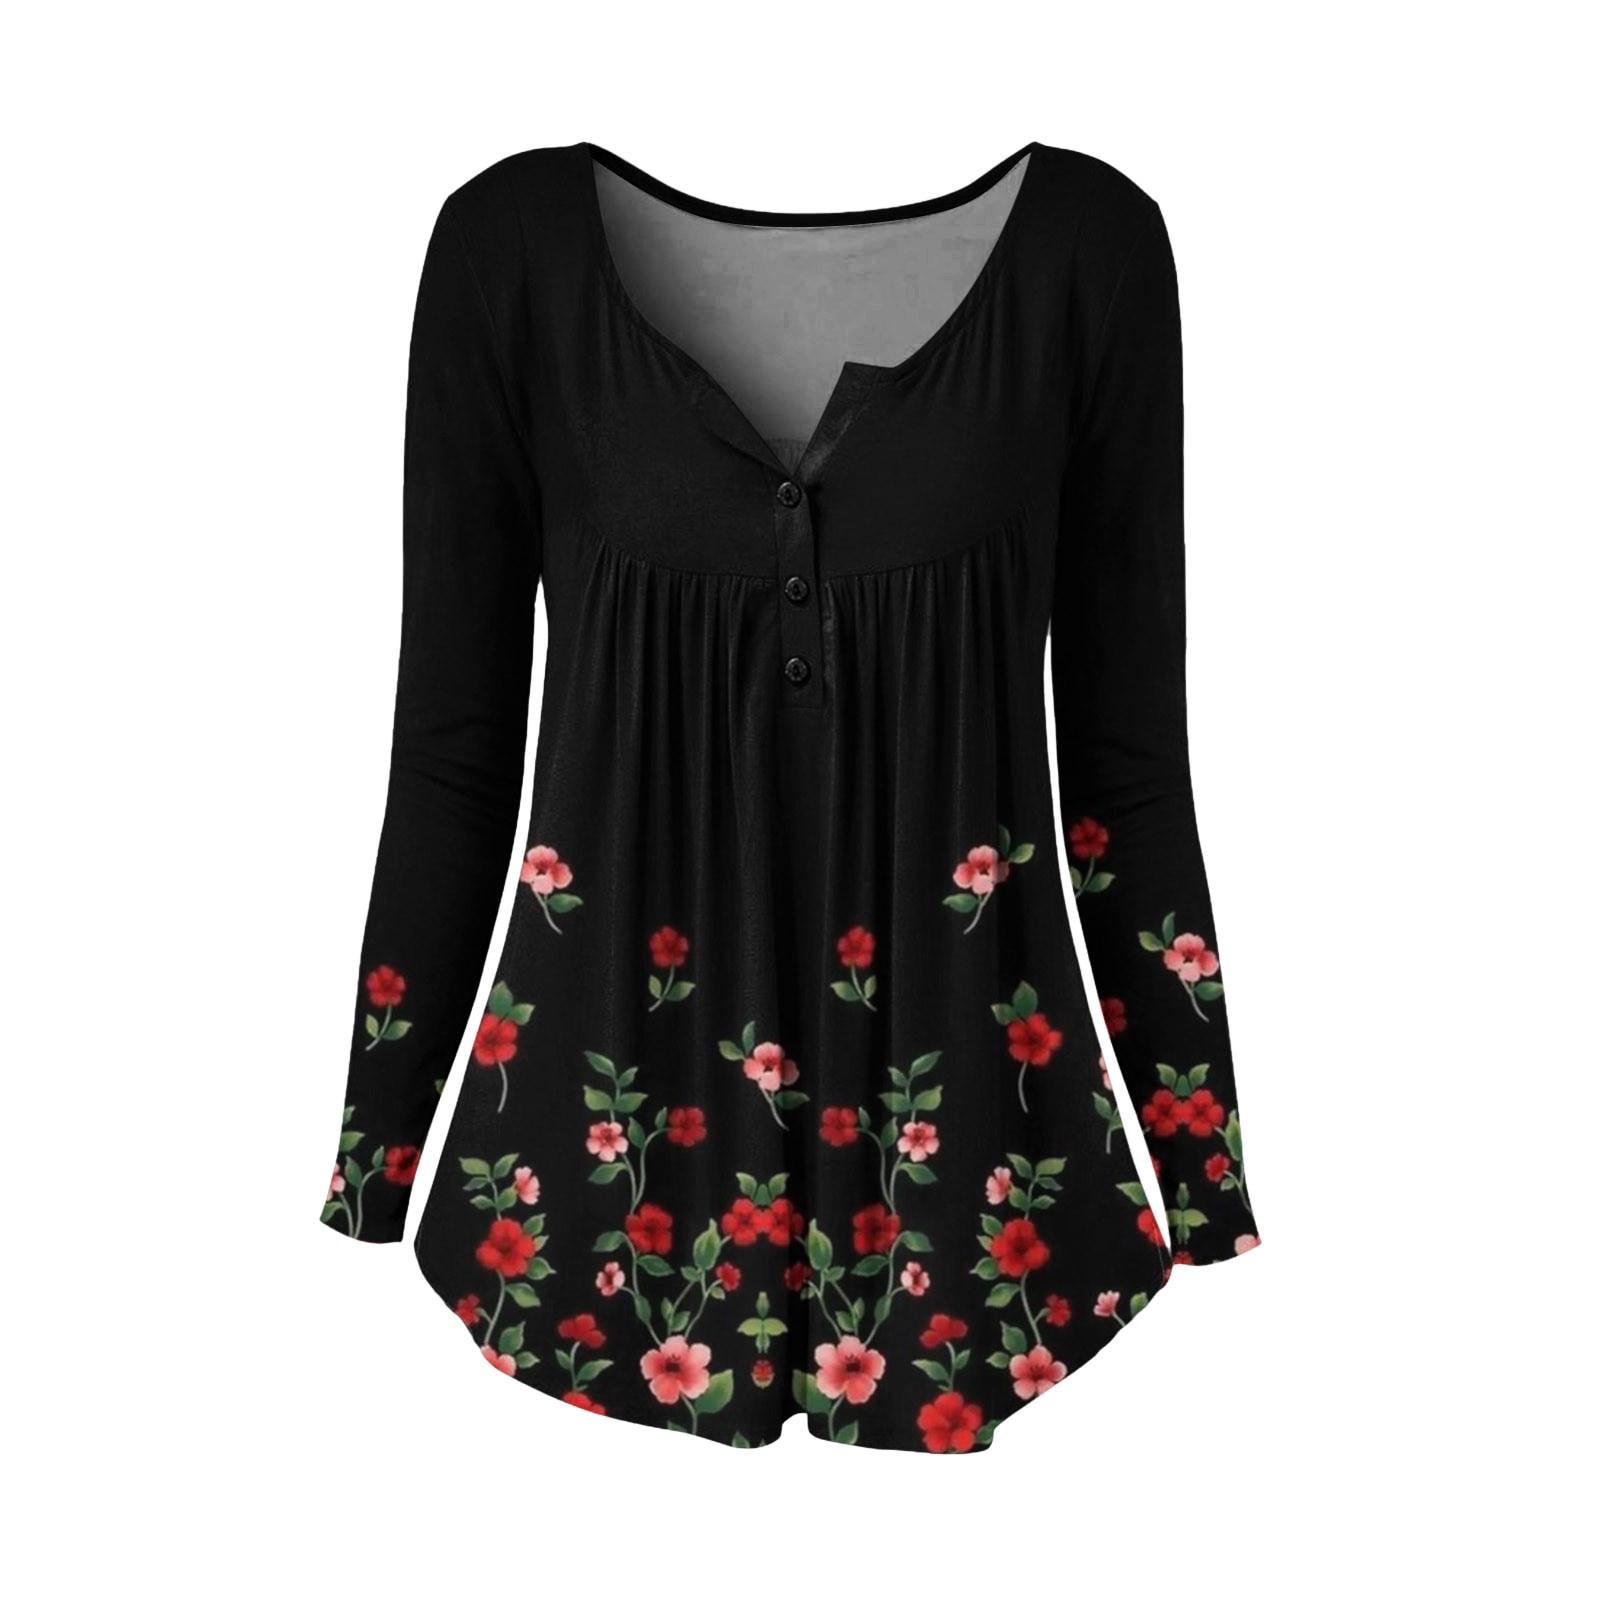 Vintage Pleated Blouse Shirt Loose Flower Print Blouse Tops Round Neck Long-sleeve Top Cotton Shirt Autumn Streetwear Рубашка C8